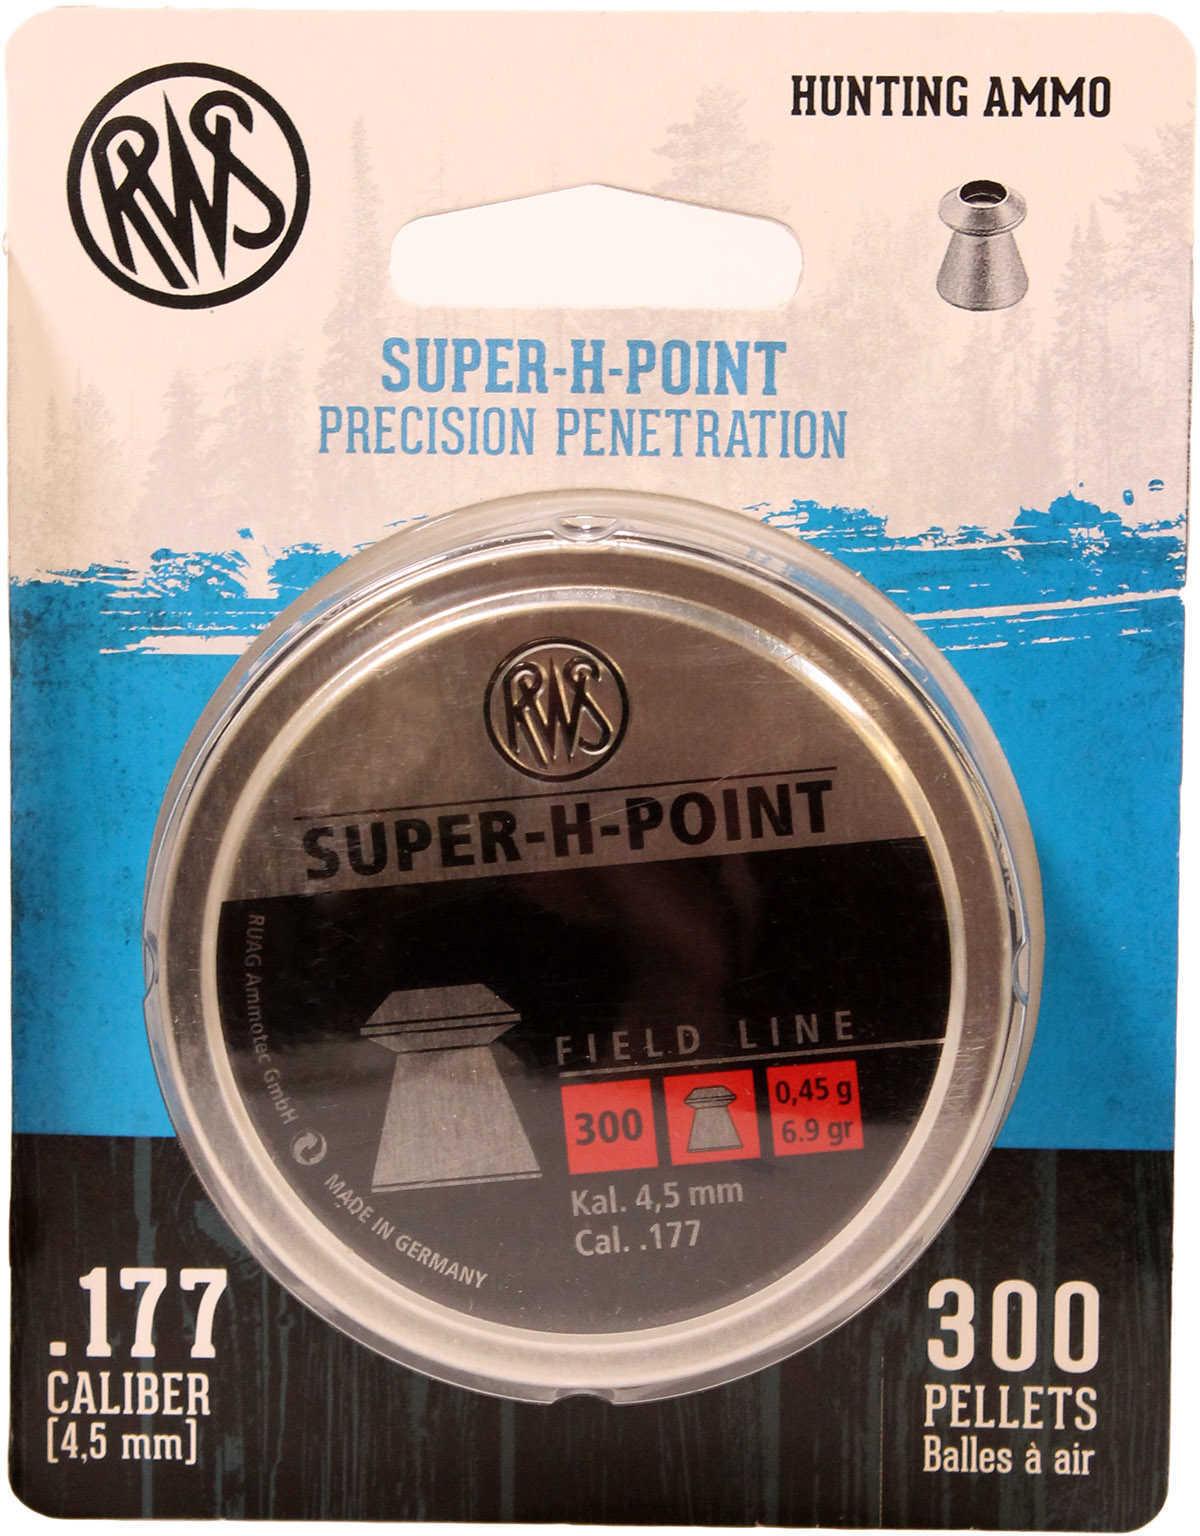 Umarex USA RWS Super-H-Point-Field Line Pellets .177 Caliber, Per300 Md: 2317403